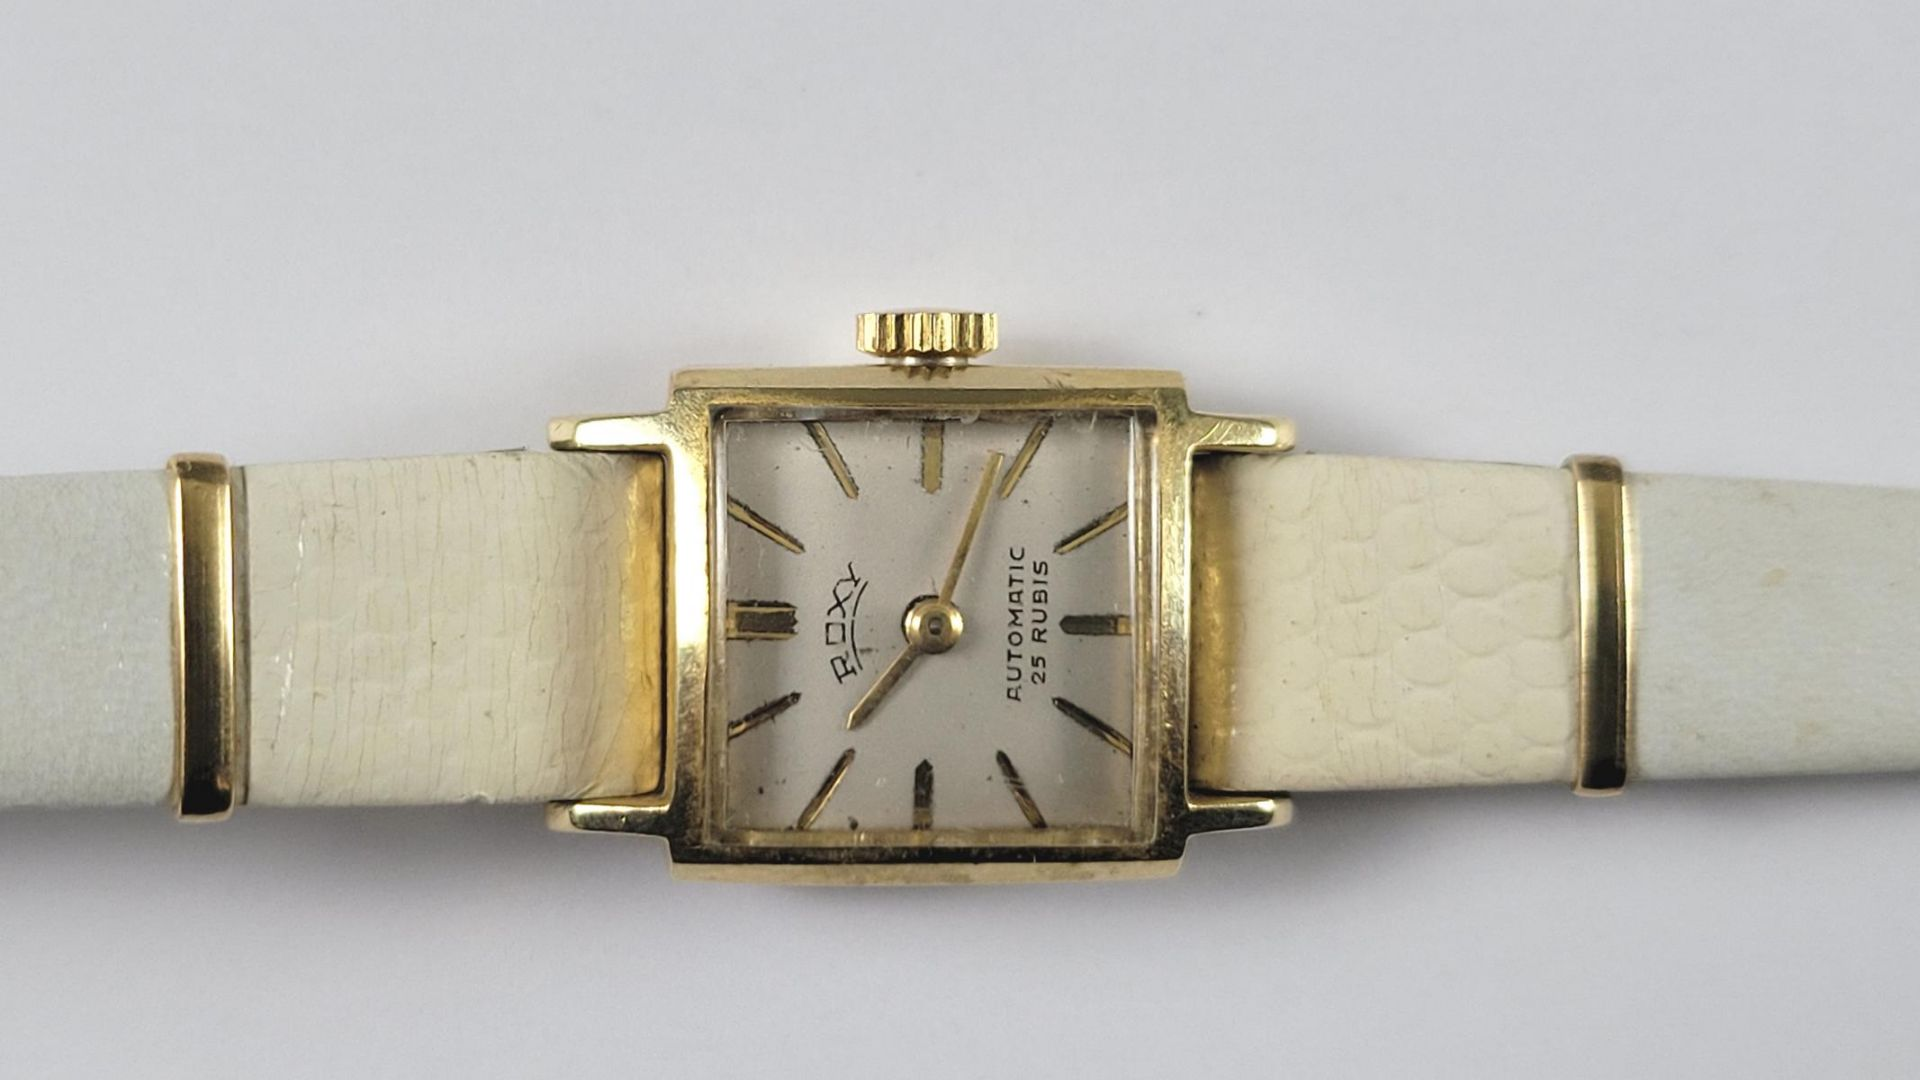 Goldene Roxy Damenarmbanduhr, 14 Karat Gelbgold - Bild 2 aus 4